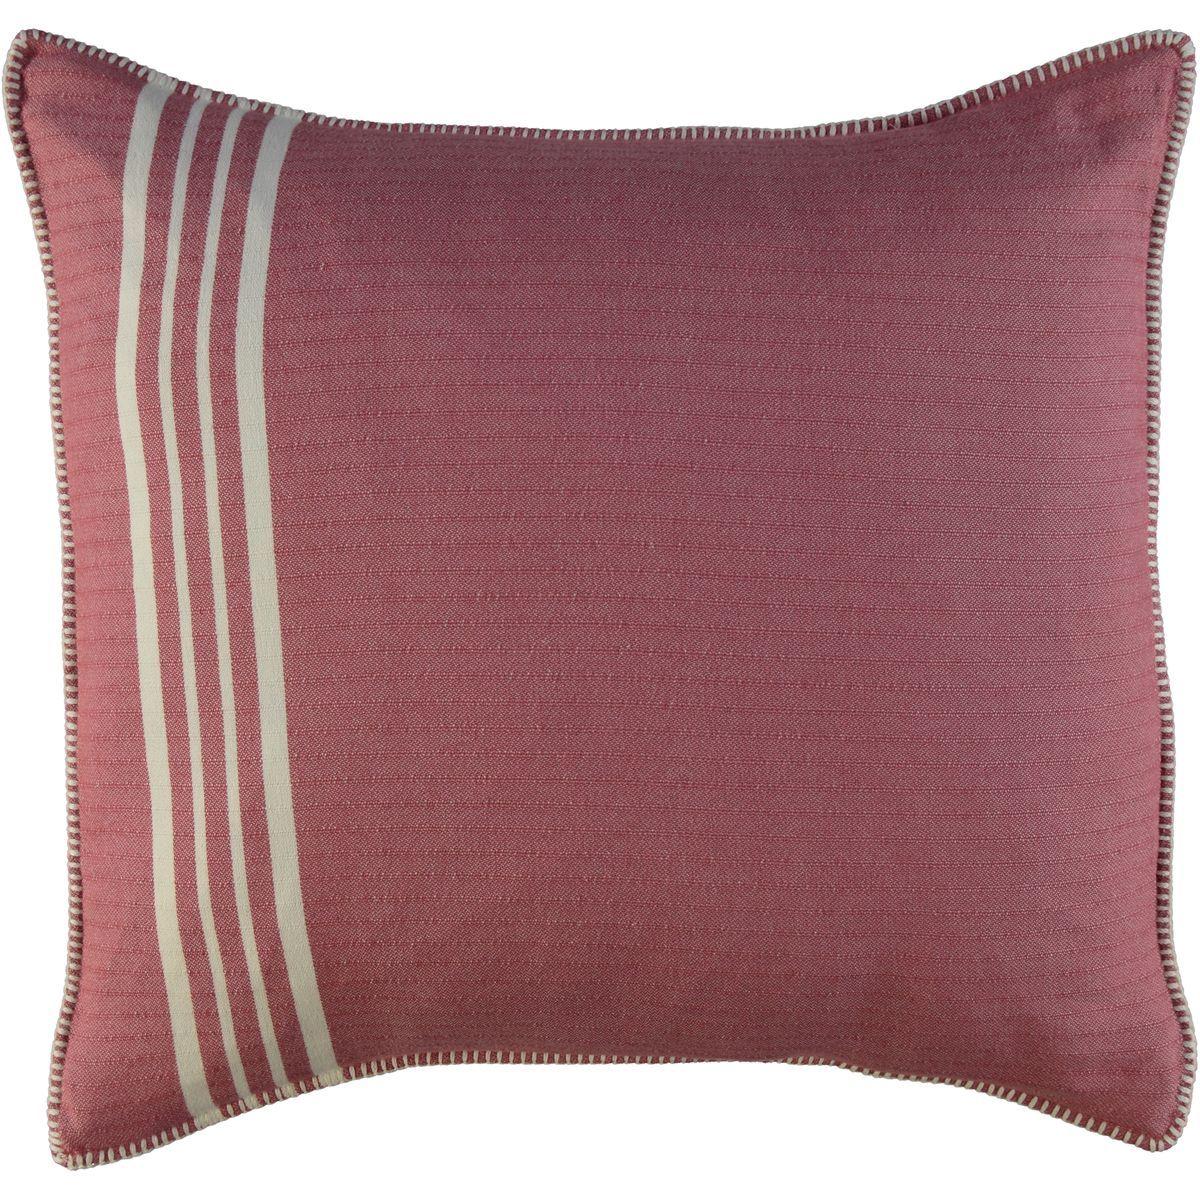 Cushion Cover Sultan - Dusty Rose / 65x65